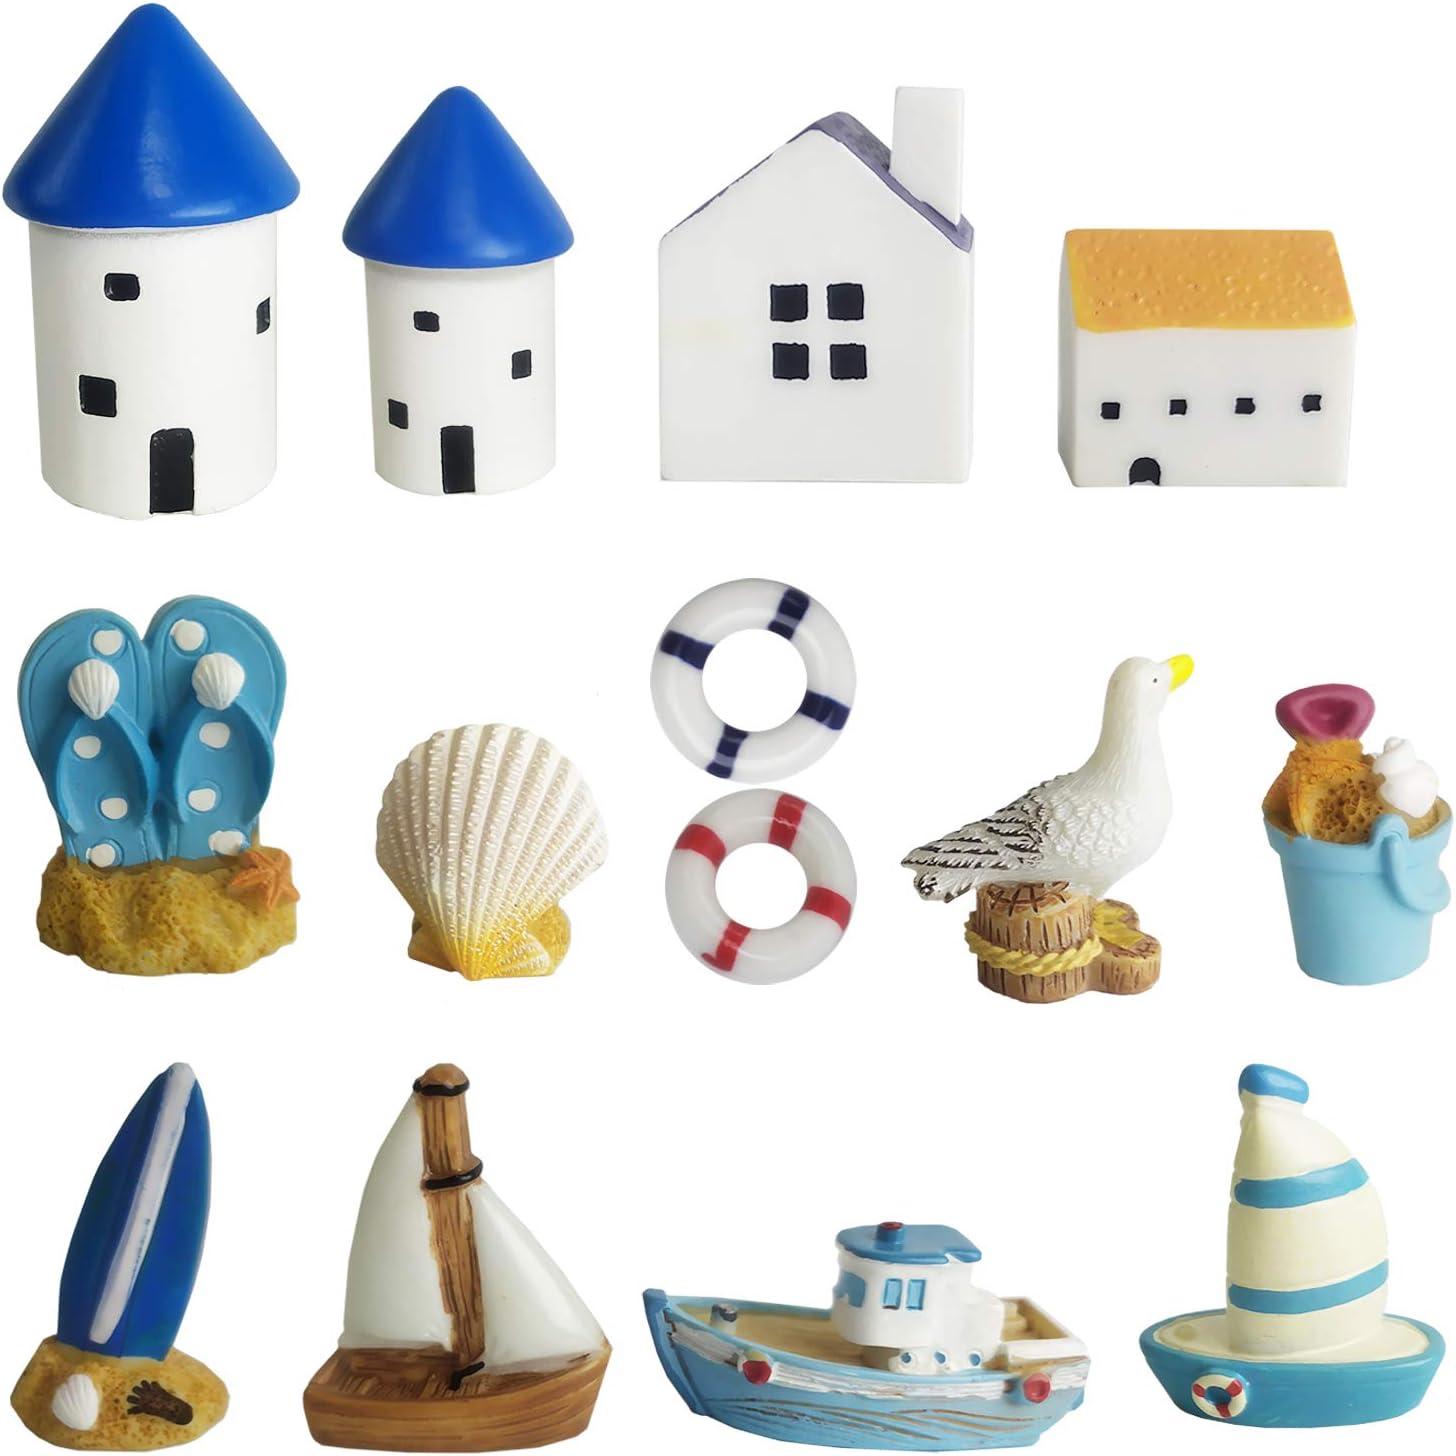 BEZALEL 14pcs Beach Style Miniature Fairy Garden Accessories - DIY Fairy Garden Kit for Adults Including Beach Fairy Garden House,Boat,Swim Ring,Shell,Seagull,etc -Mini Fairy Garden Accessories Set